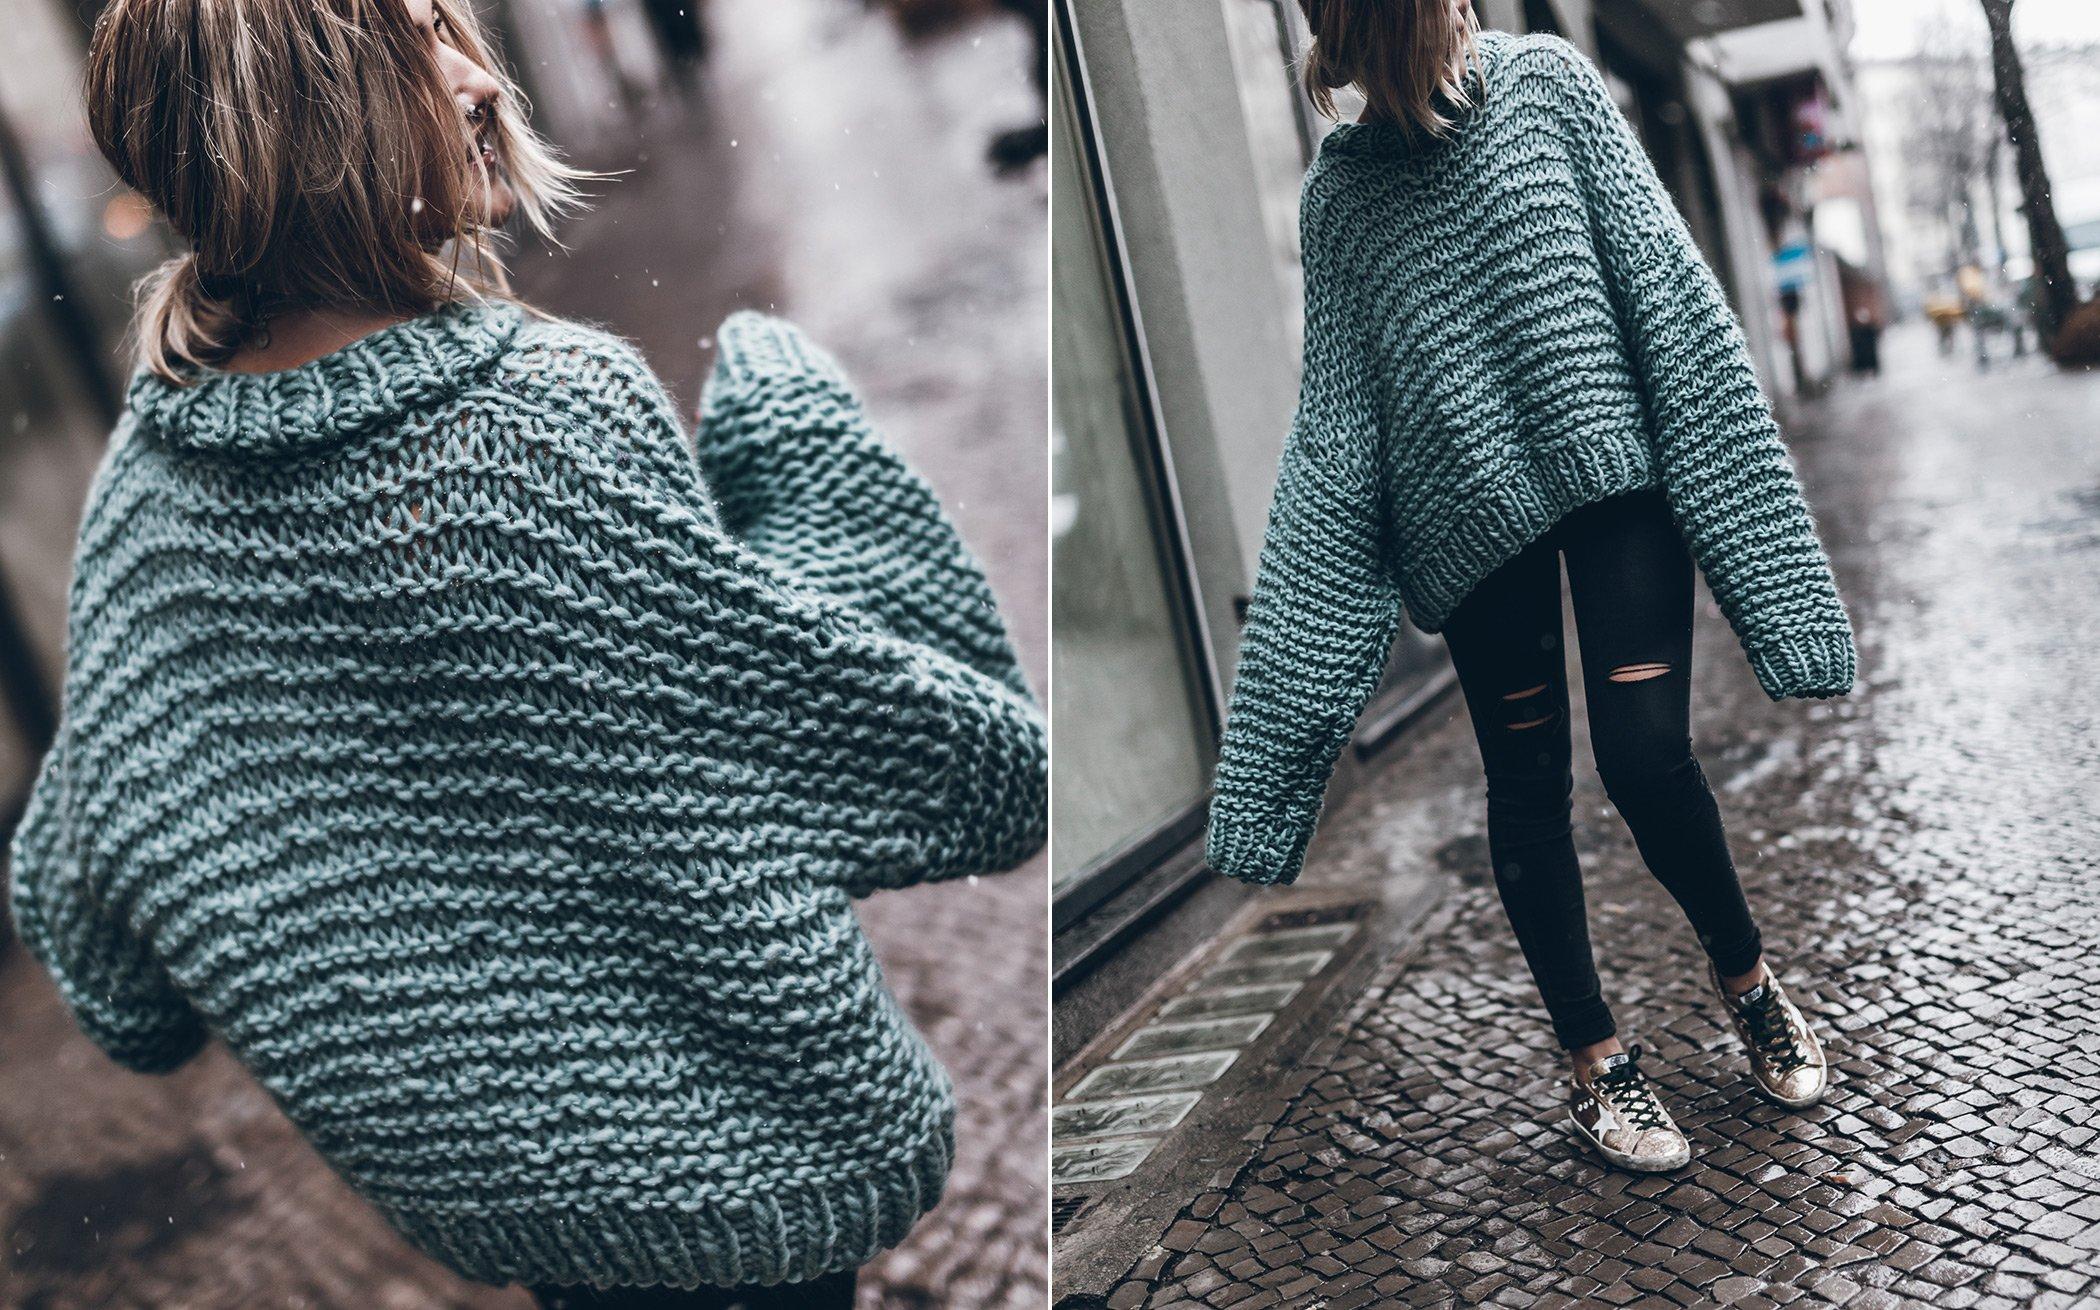 mikuta-green-selfmade-miku-knit-22